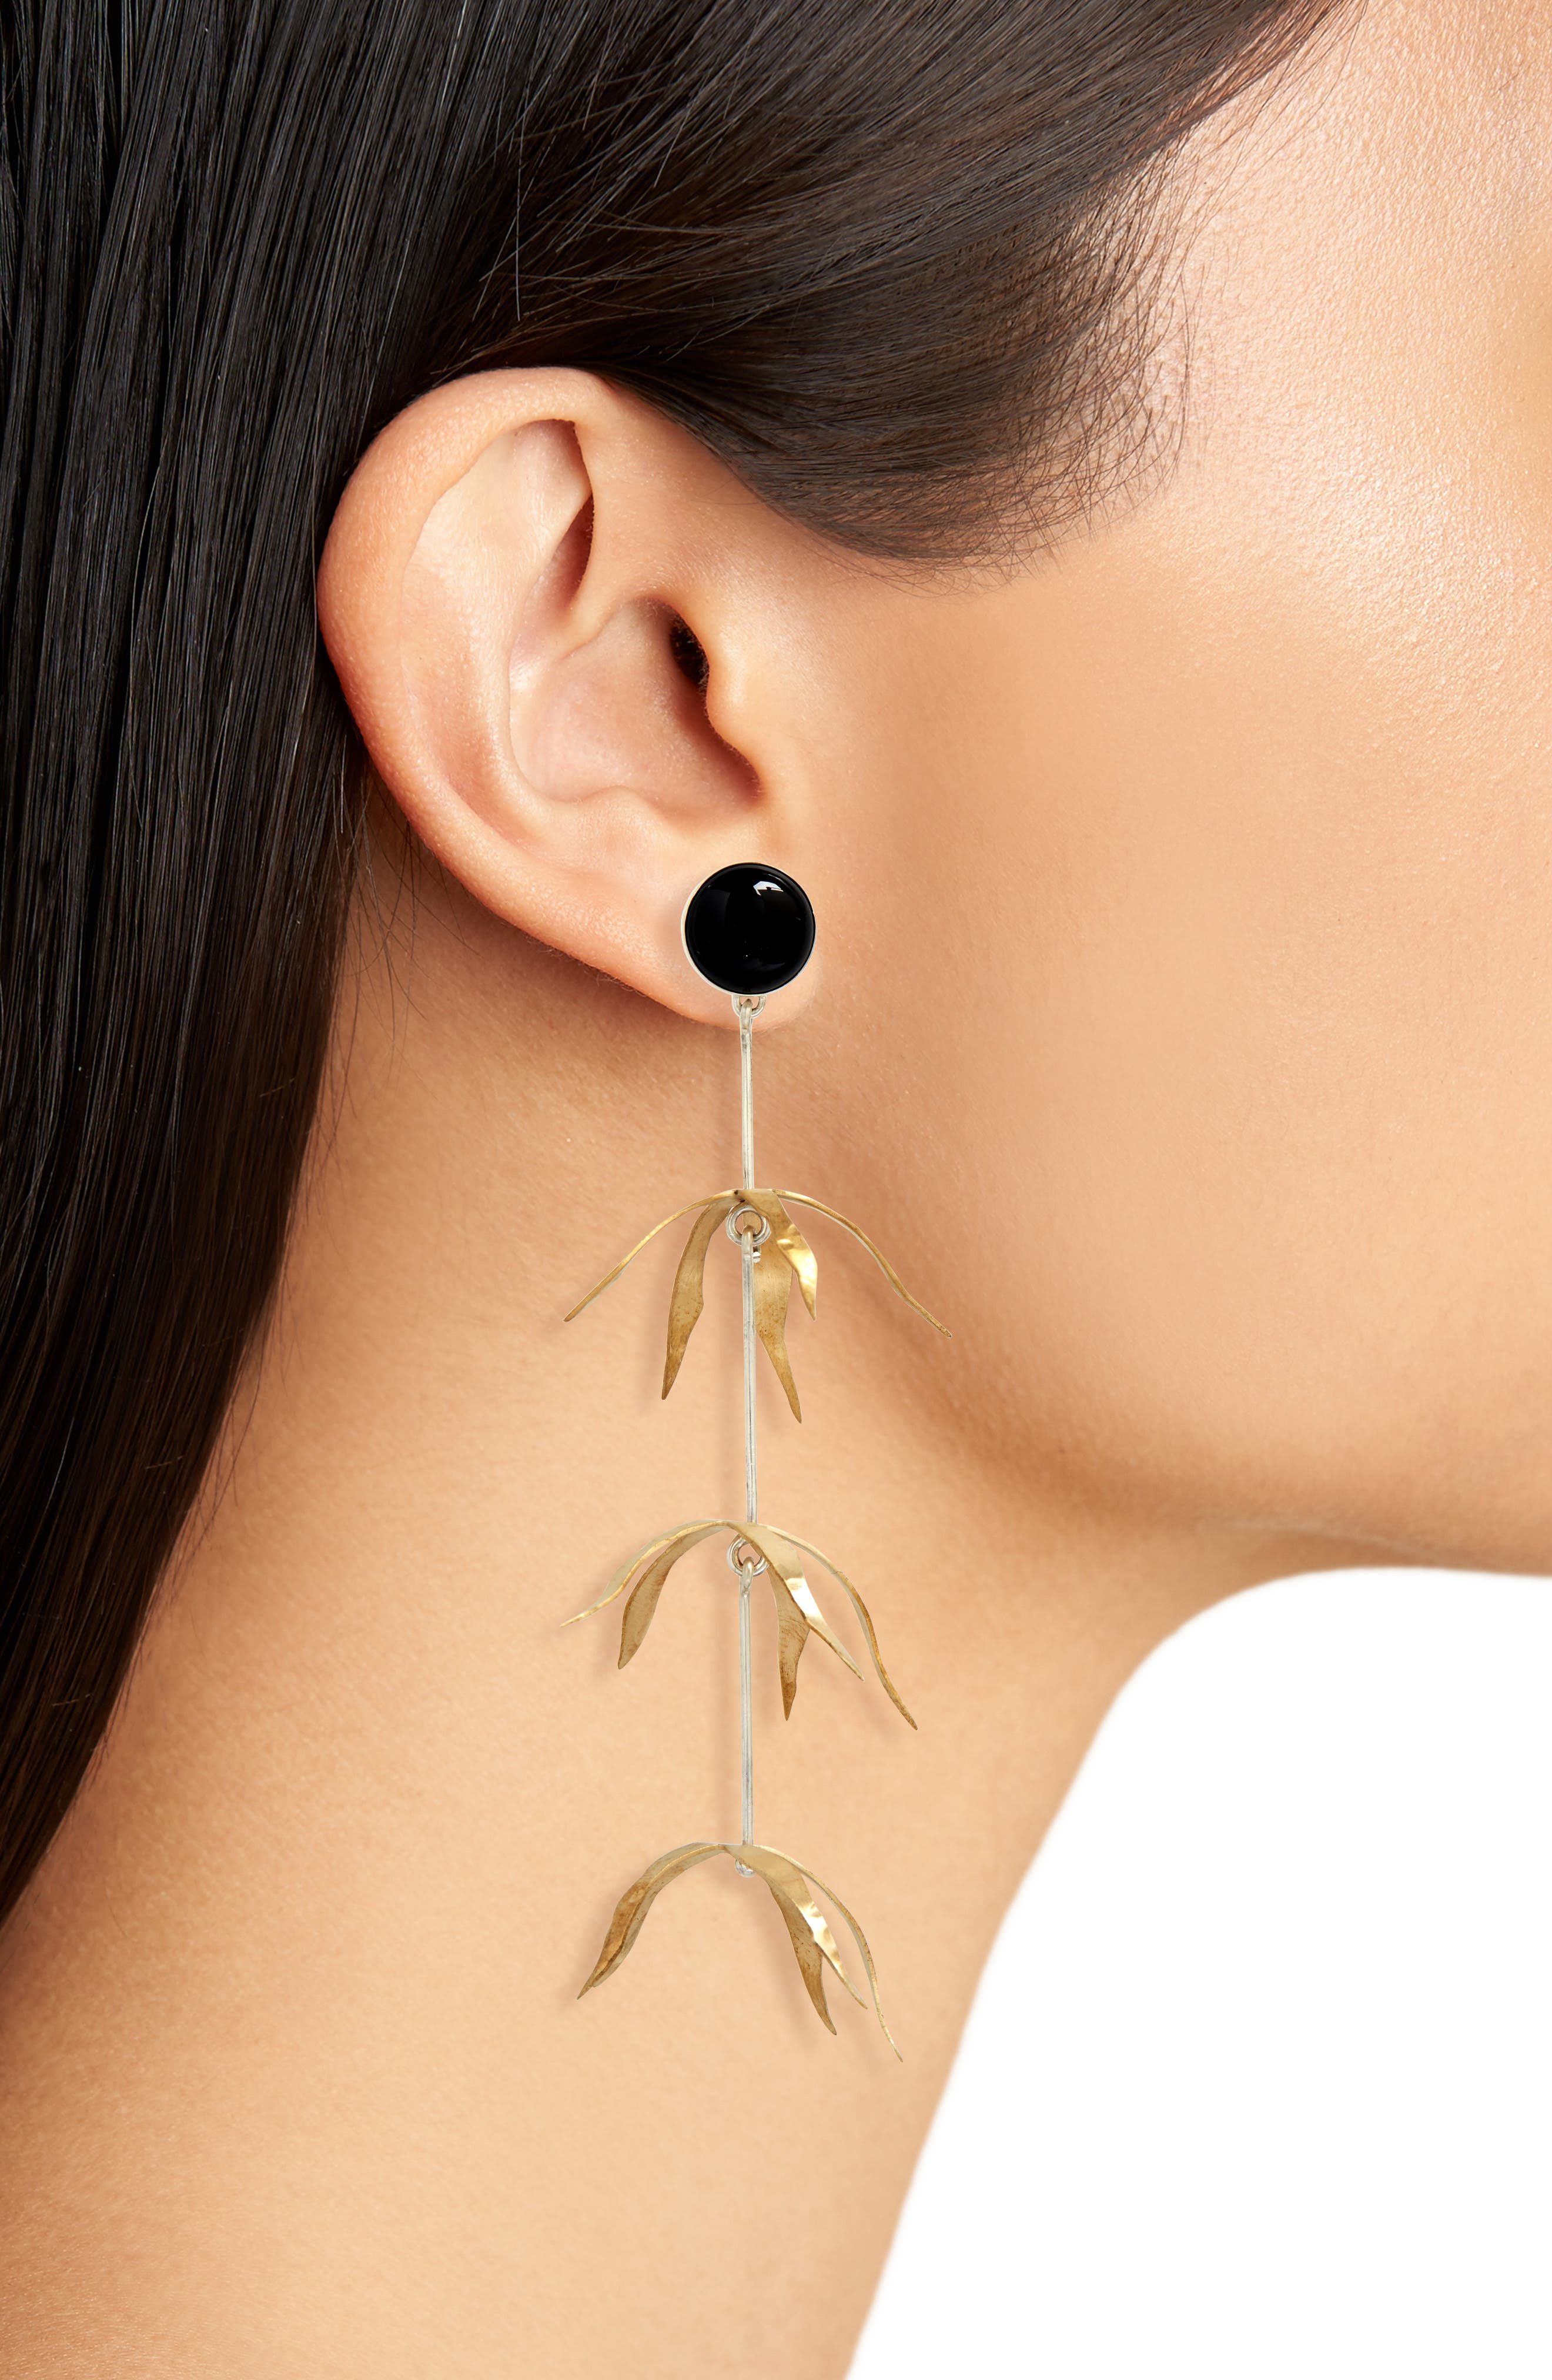 Estra Earrings,                             Alternate thumbnail 2, color,                             040